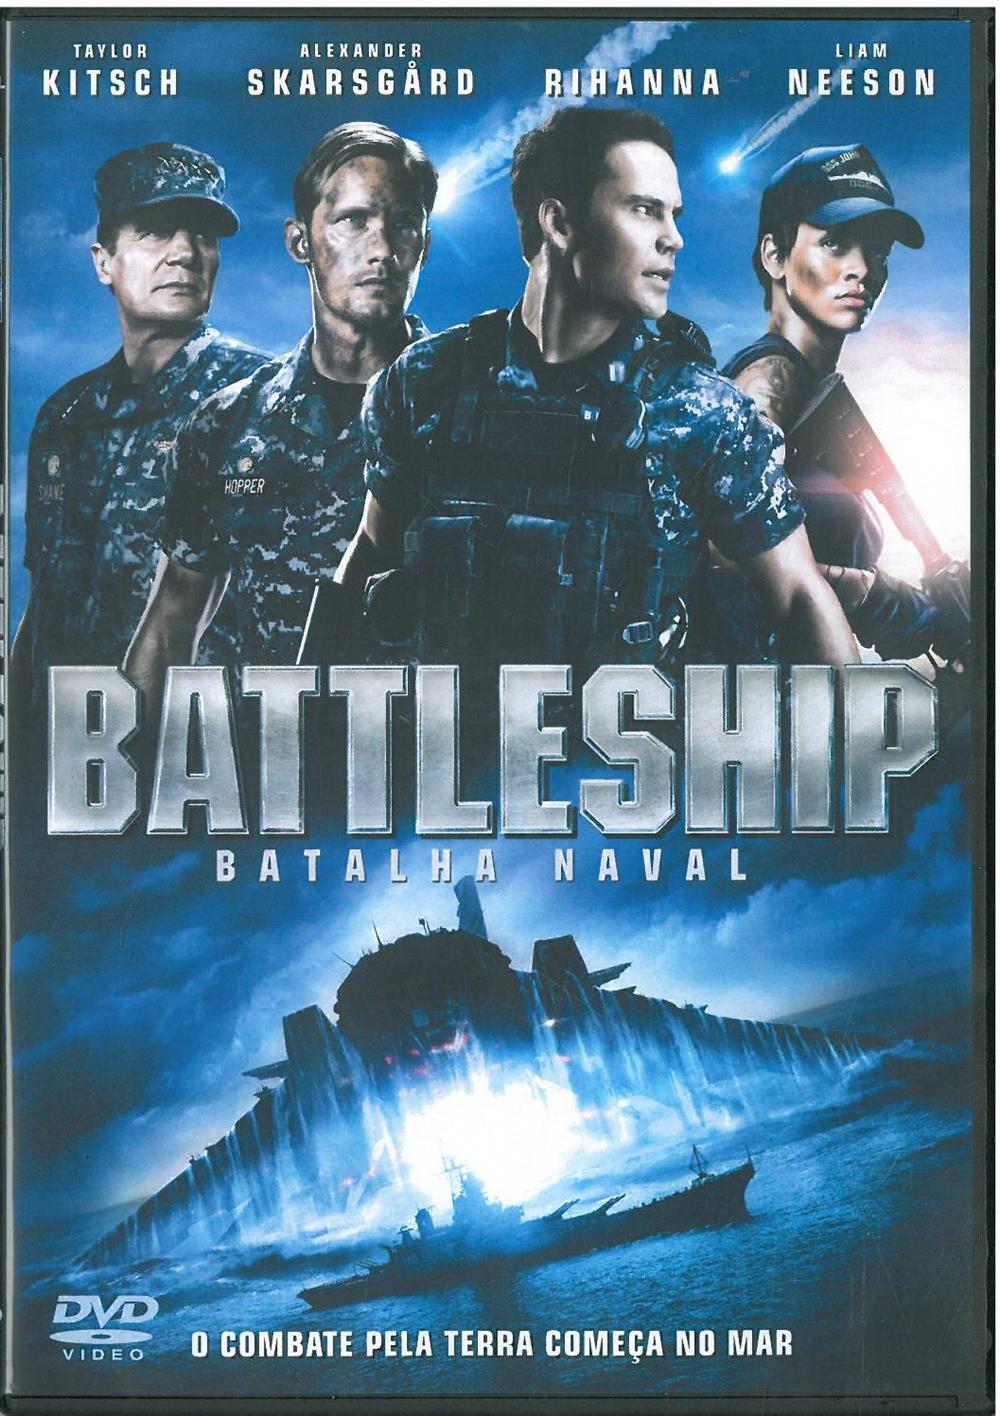 Battleship_DVD.jpg